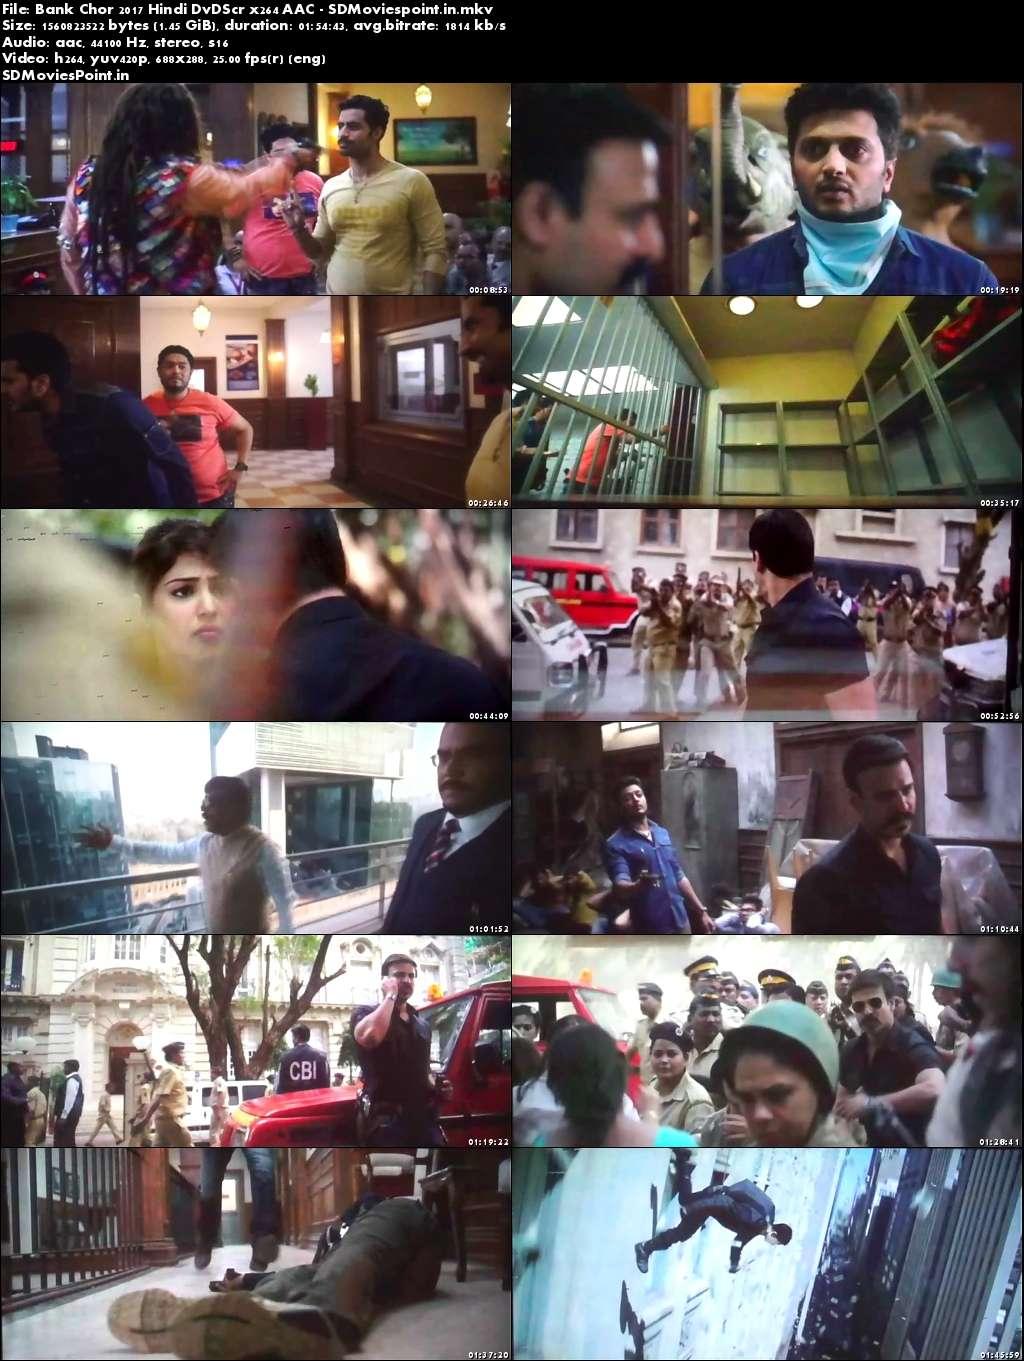 Screen Shot Bank Chor 2017 Full HD Movie Download In 720p